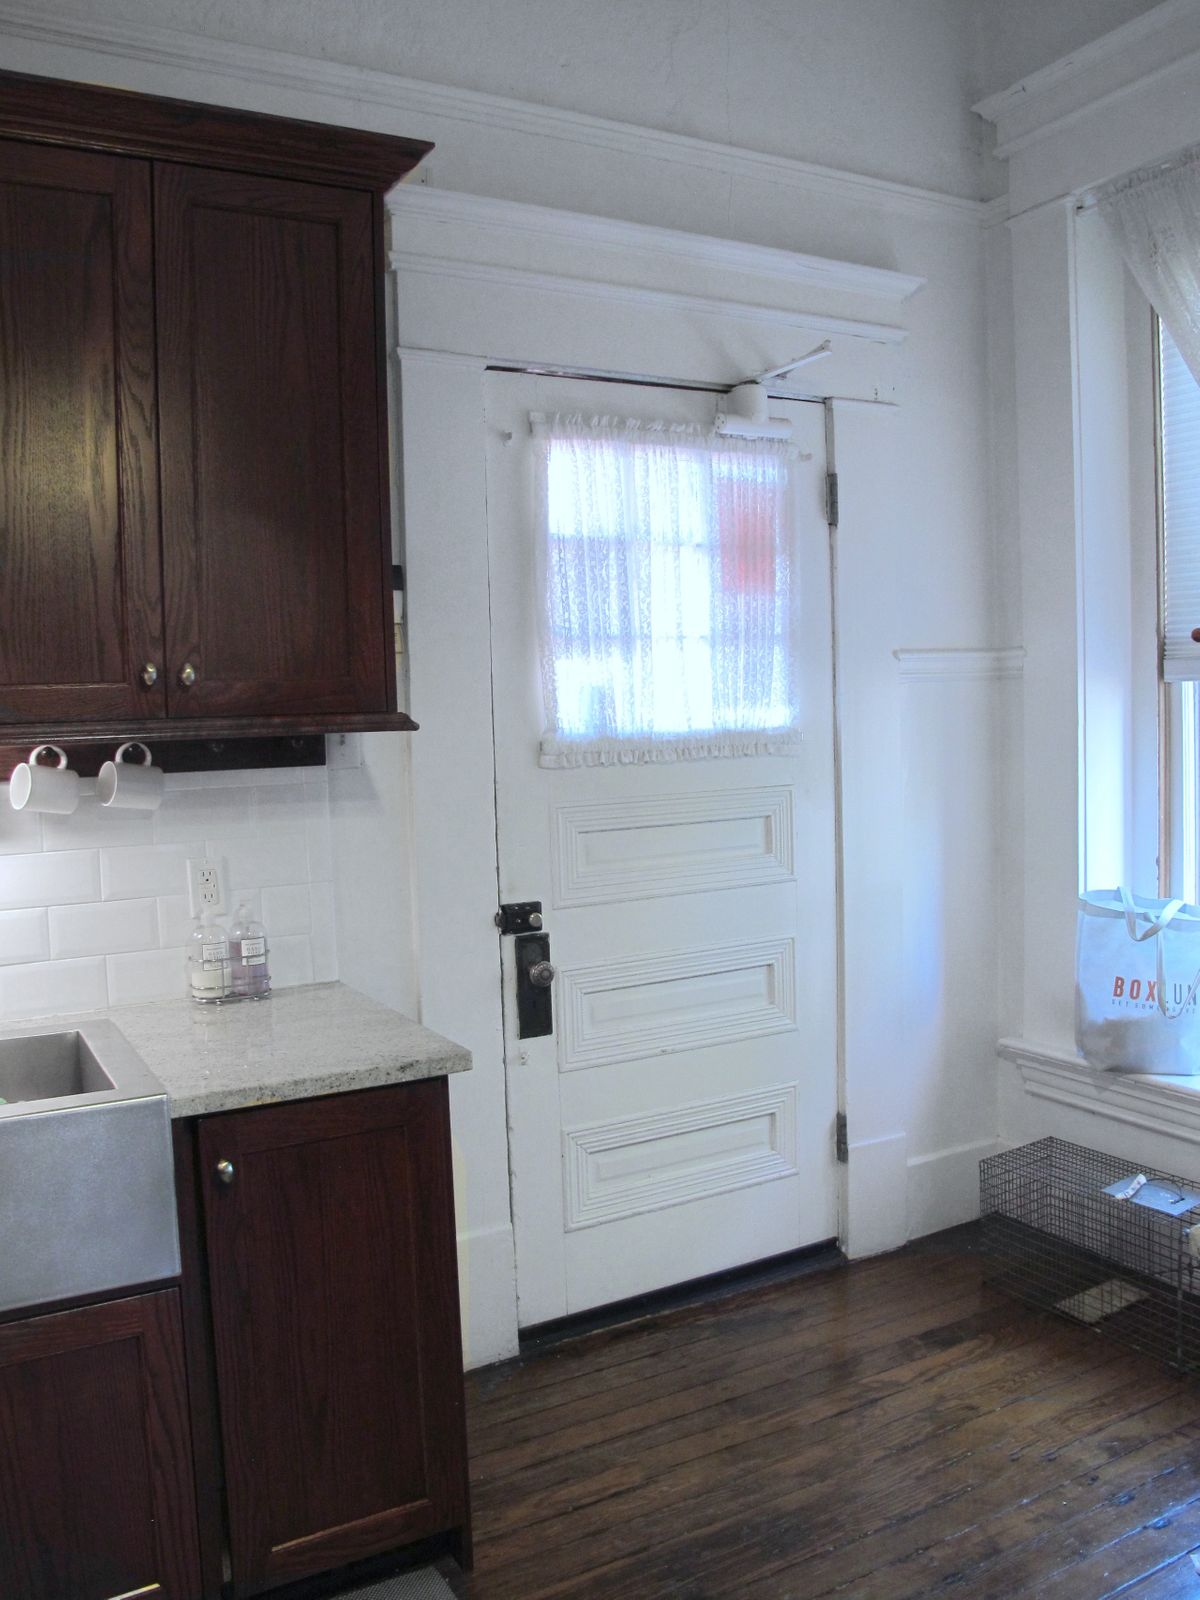 McFarland Historical Home Photo Video Shoot Location Dallas 11.jpg